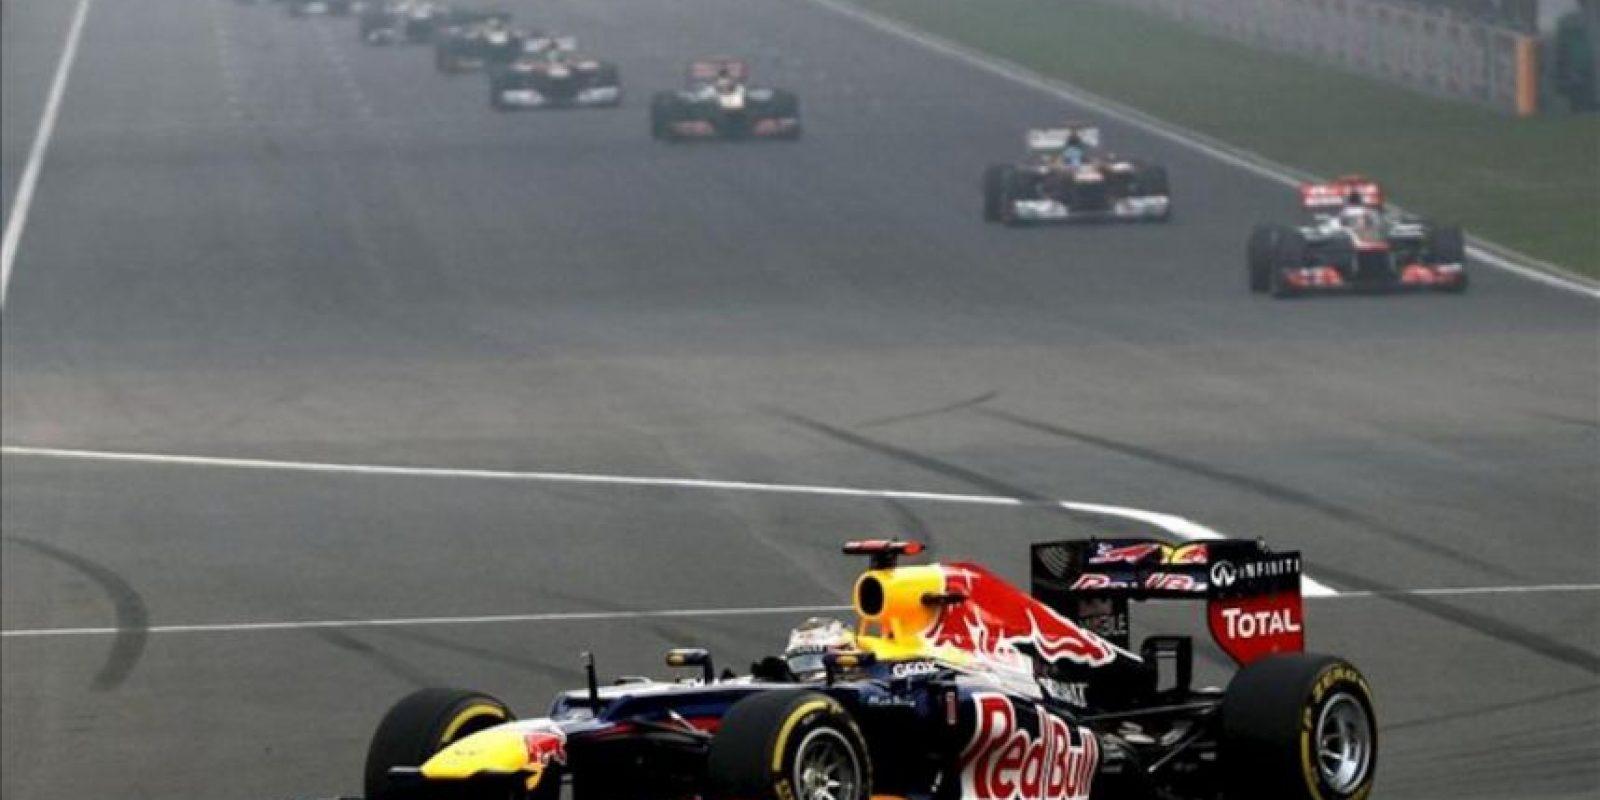 El piloto Sebastian Vettel durante la carrera. EFE